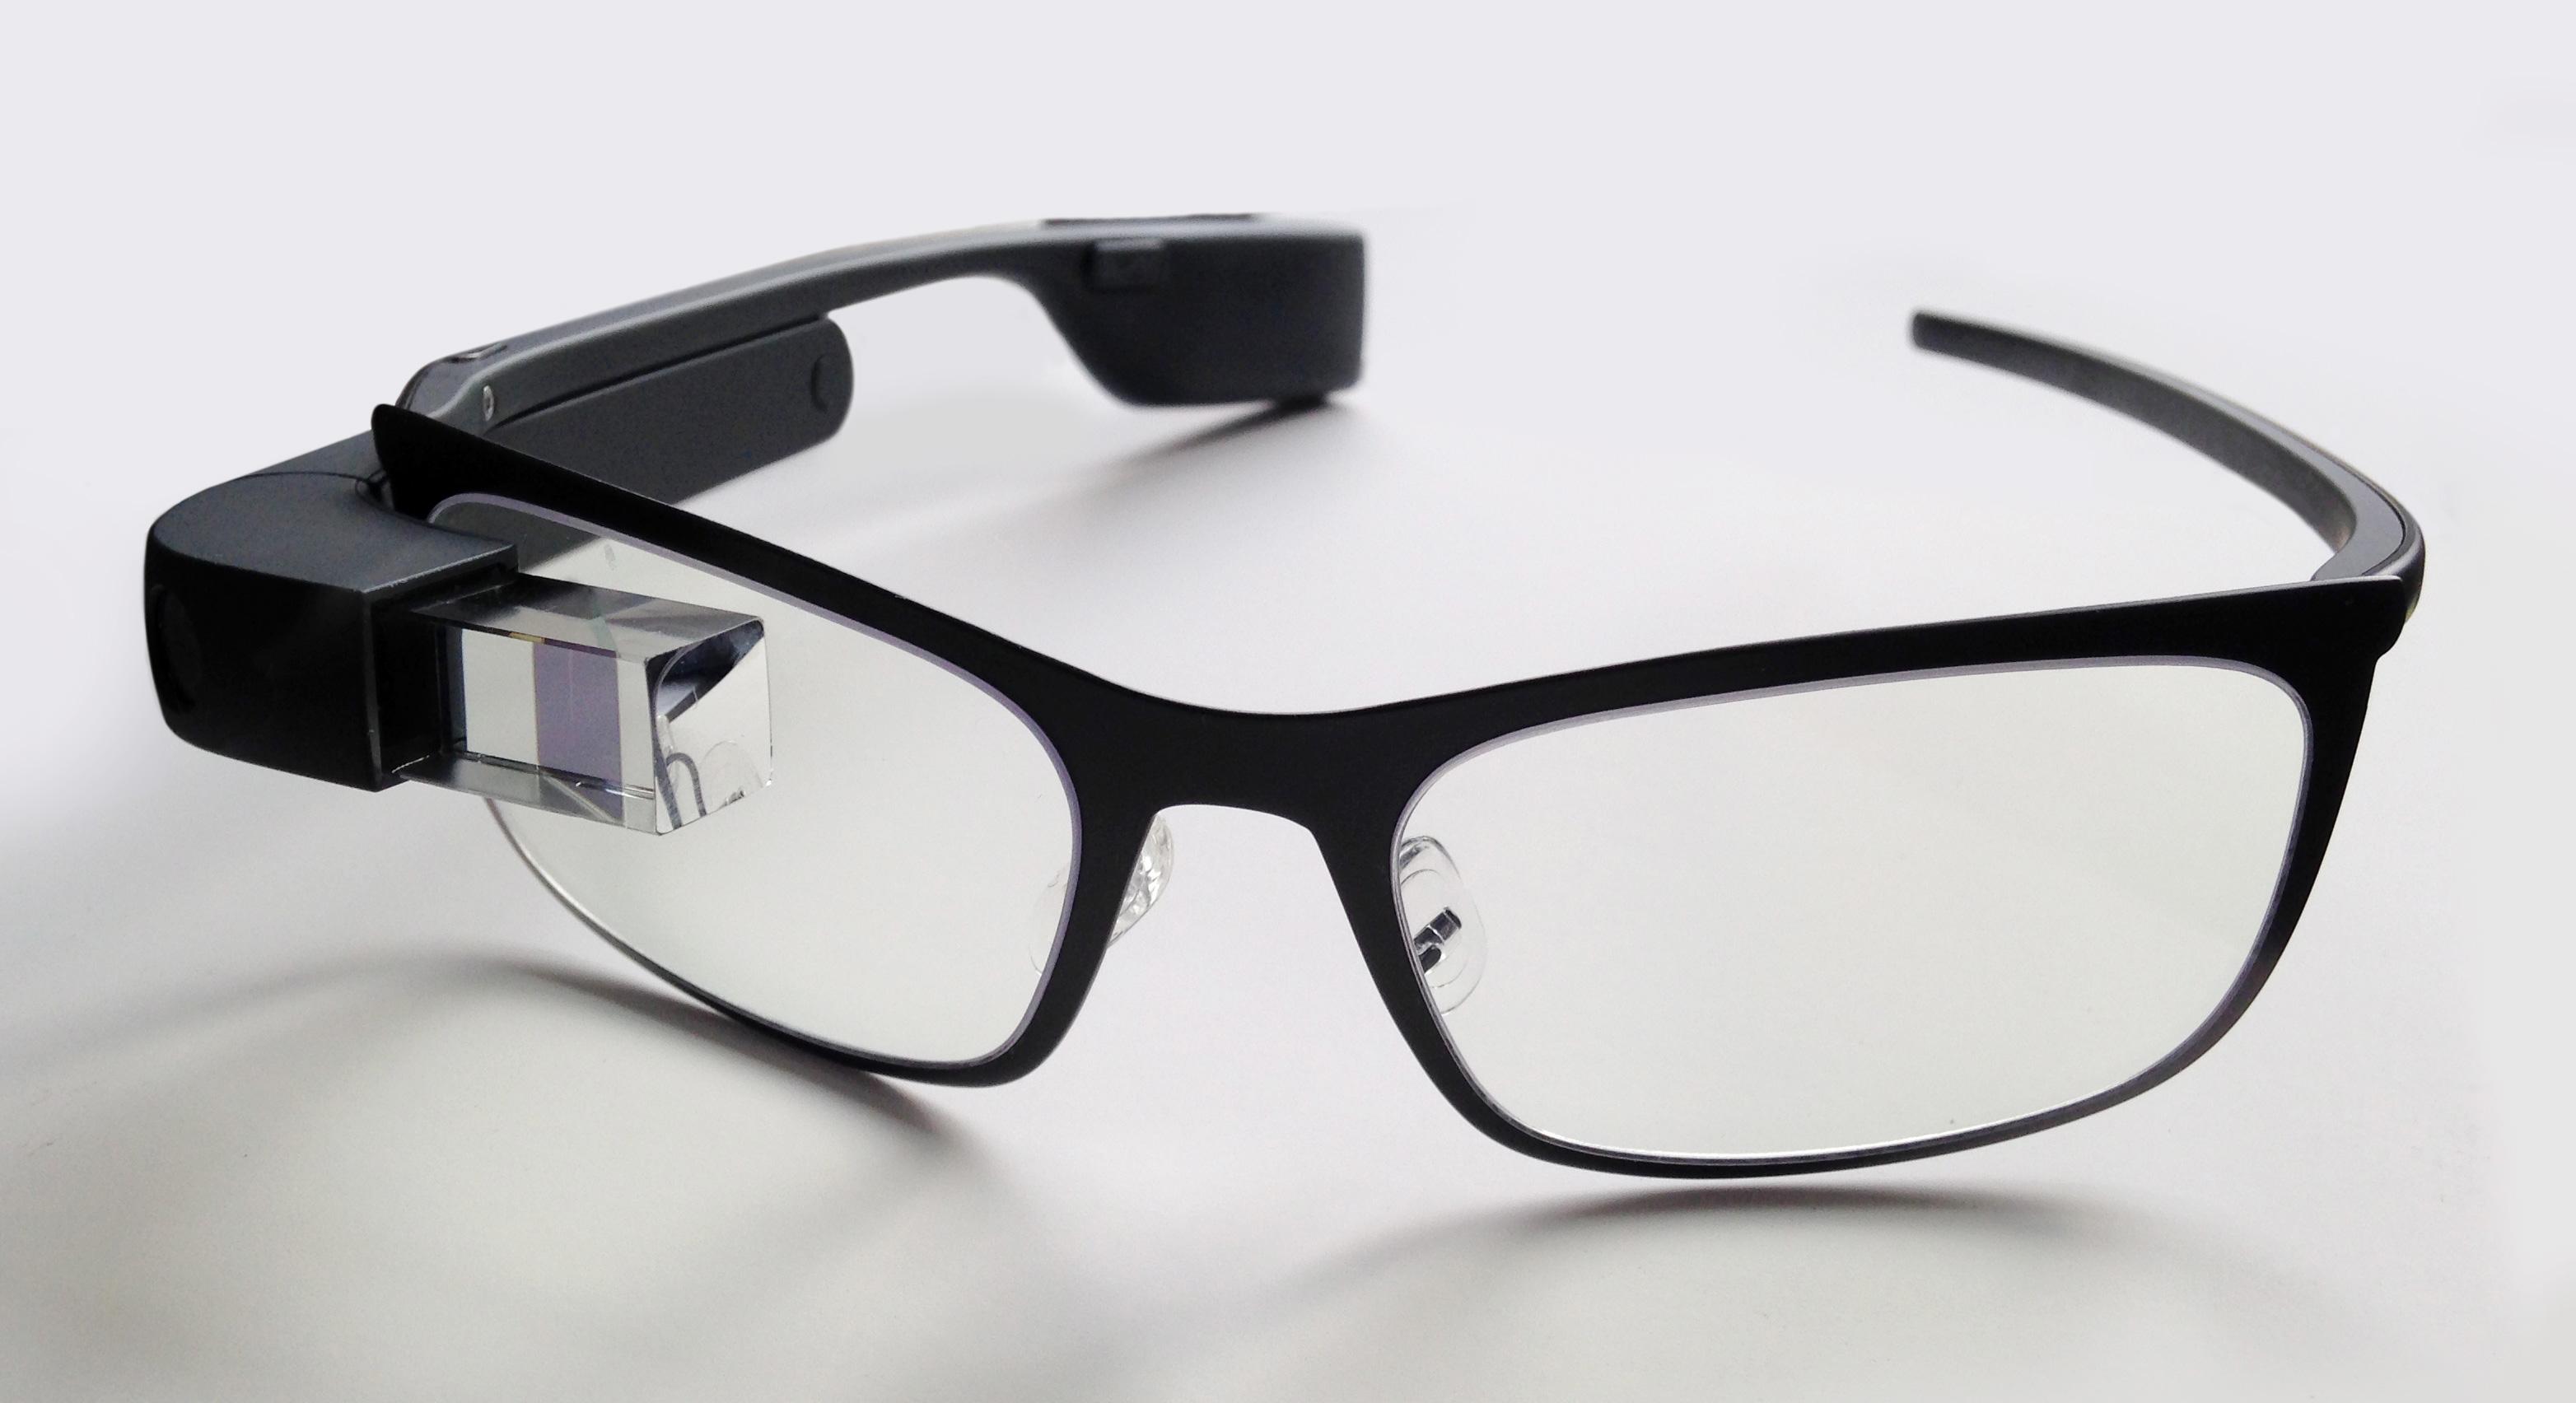 Image - Google Glass with frame.jpg   Creepypasta Wiki   FANDOM ...